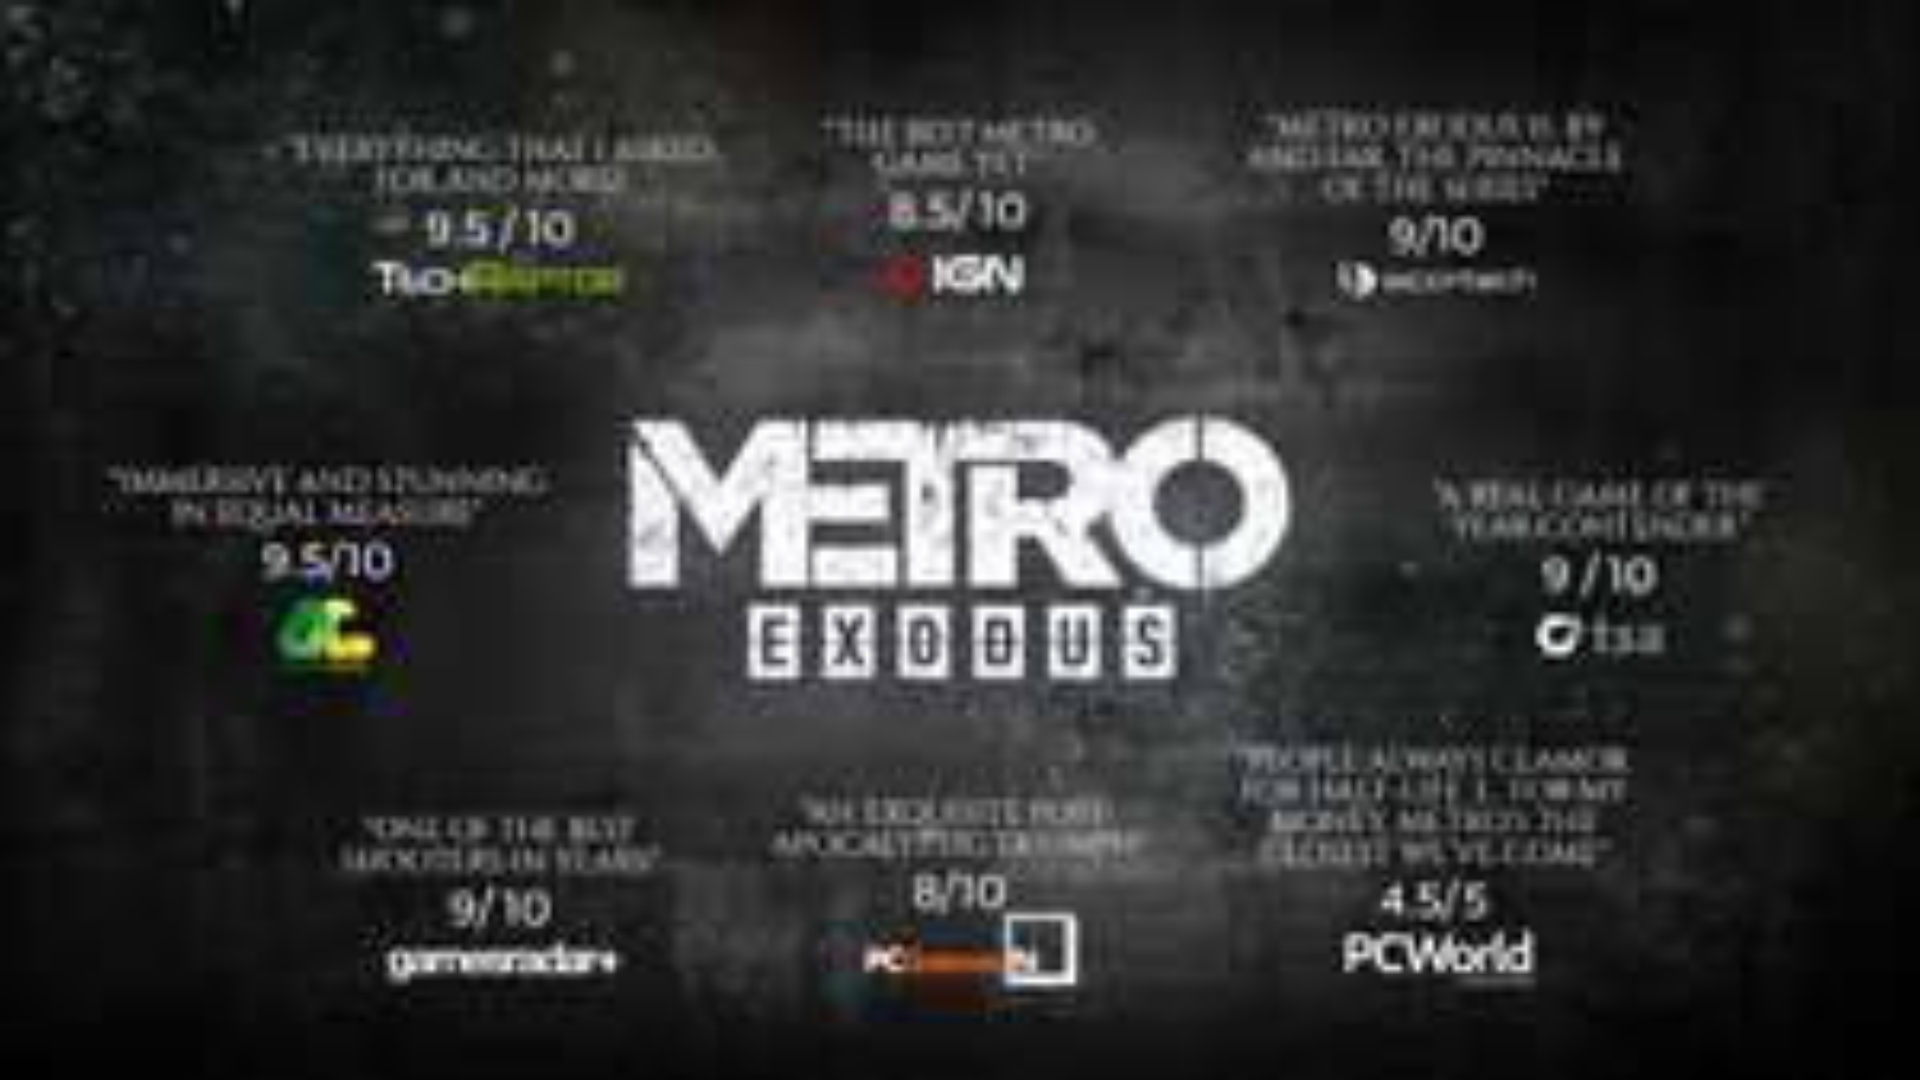 Metro Exodus PC (Epic Games Store)